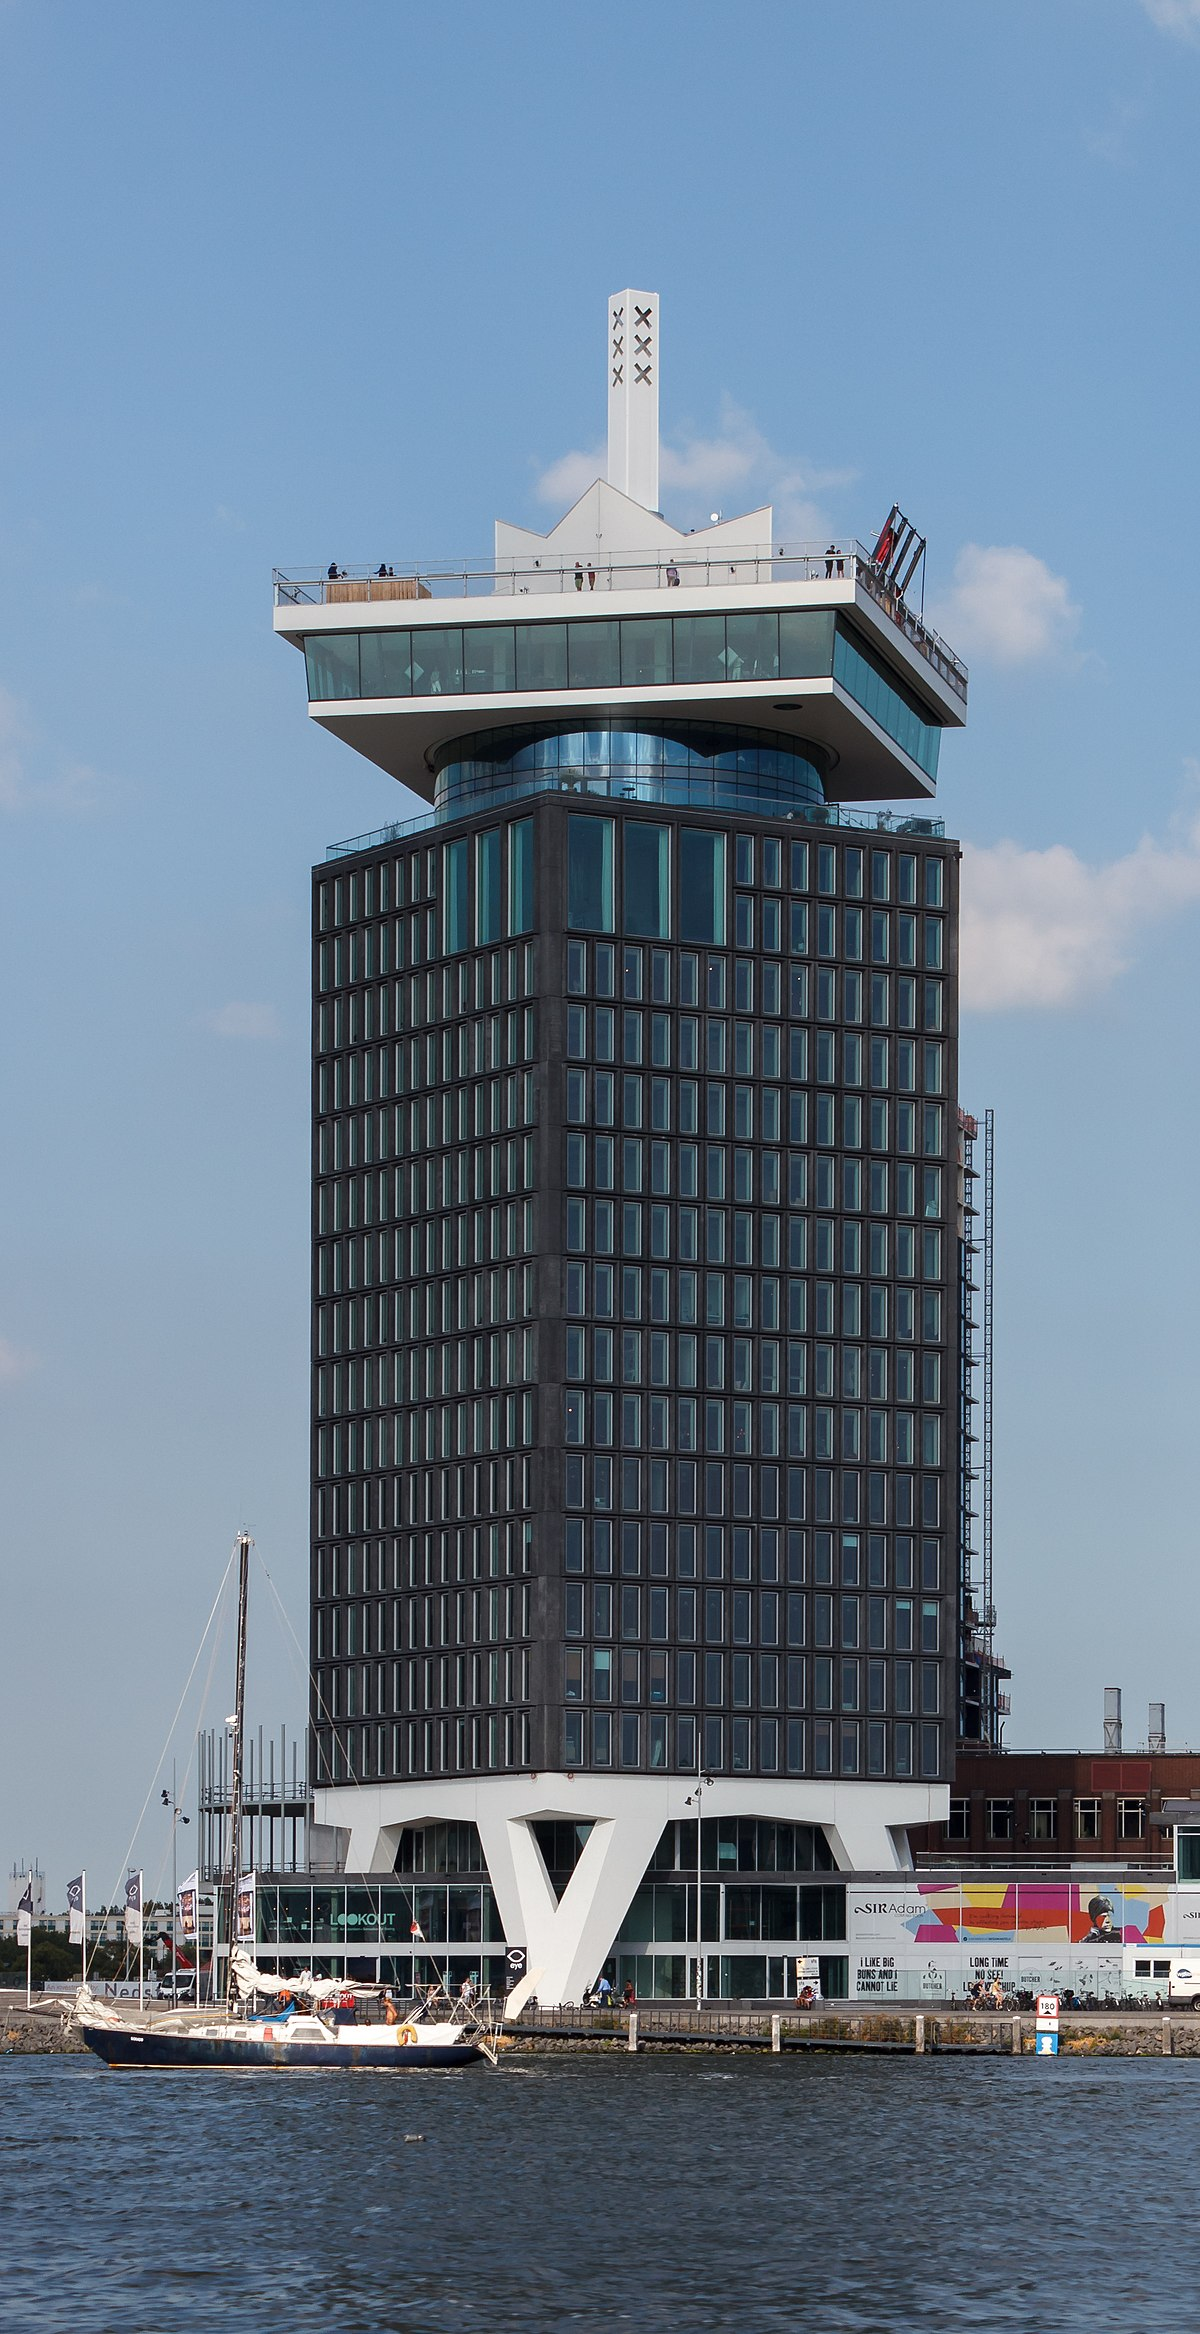 Amsterdam Hotel Noord